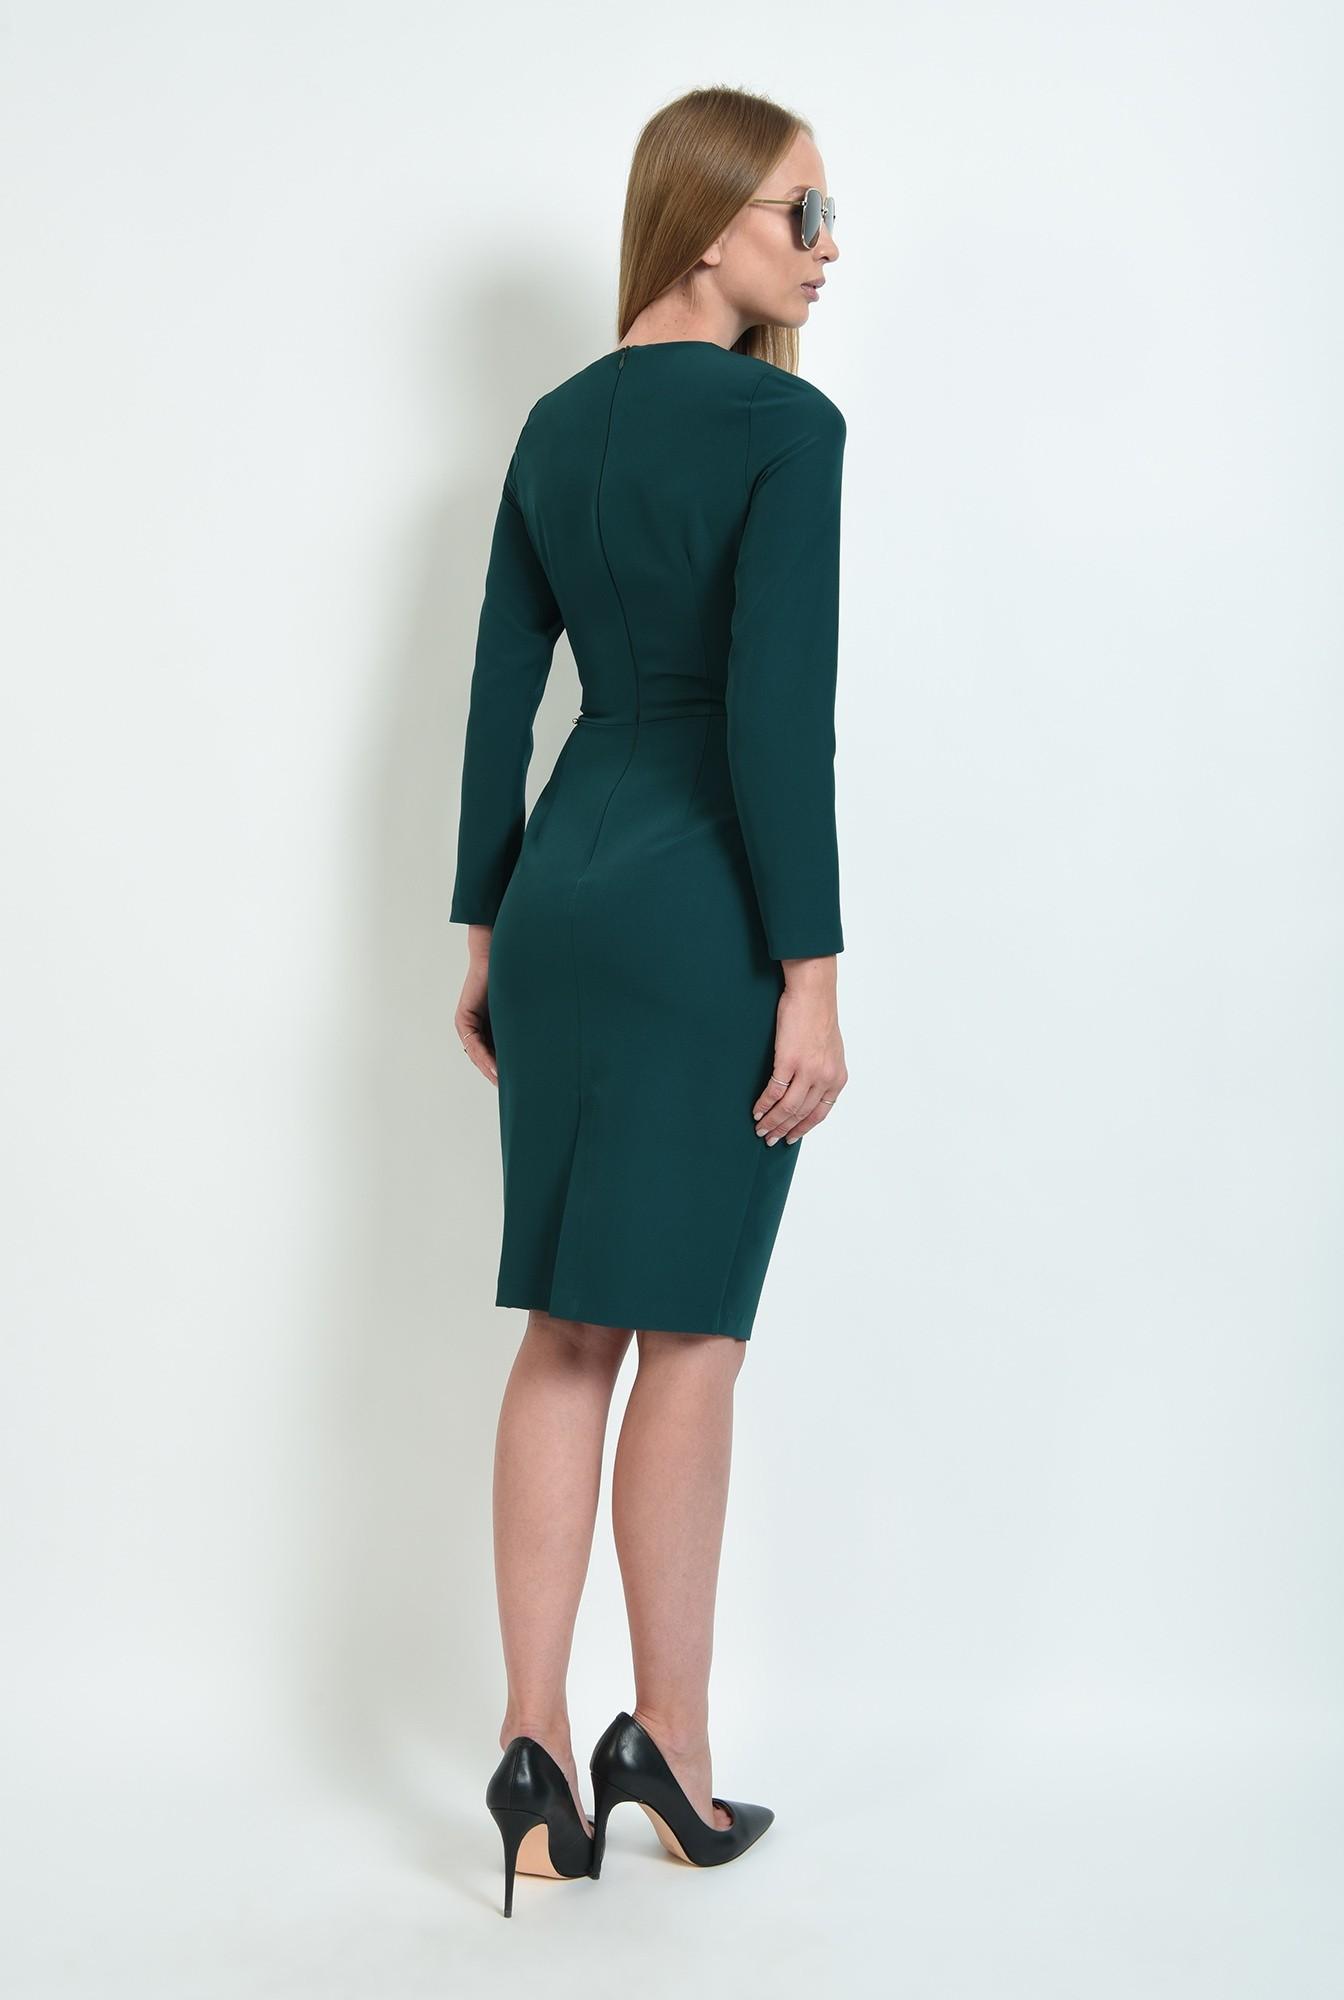 2 - rochie verde, office, cu pliuri, Poema